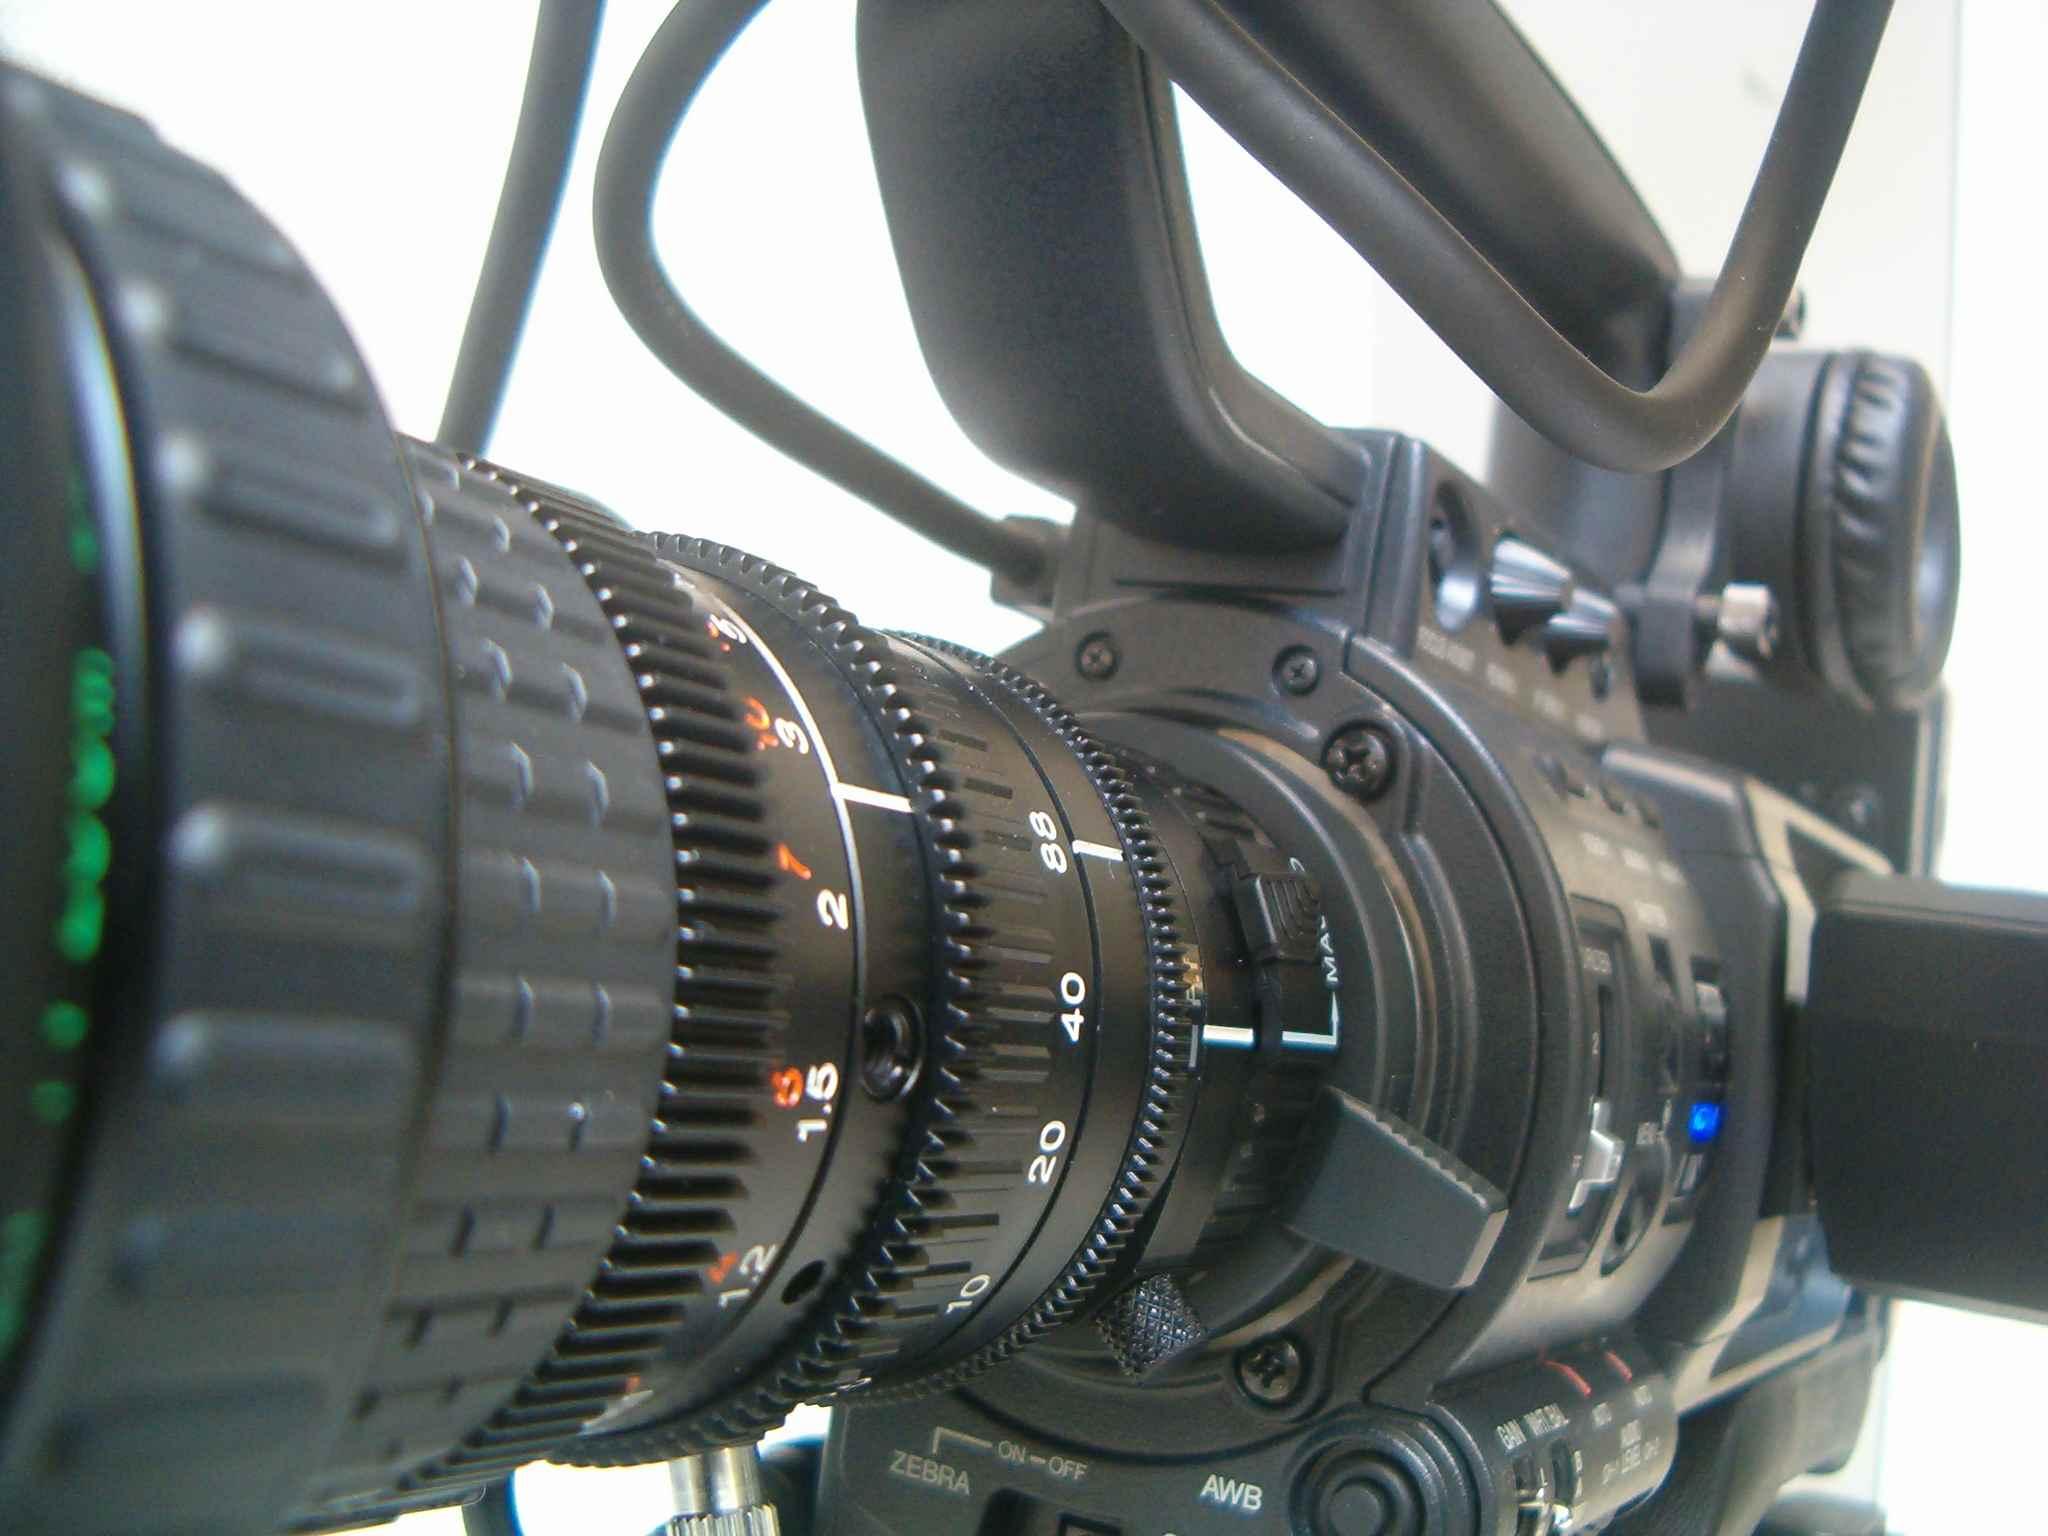 Orlando video crews